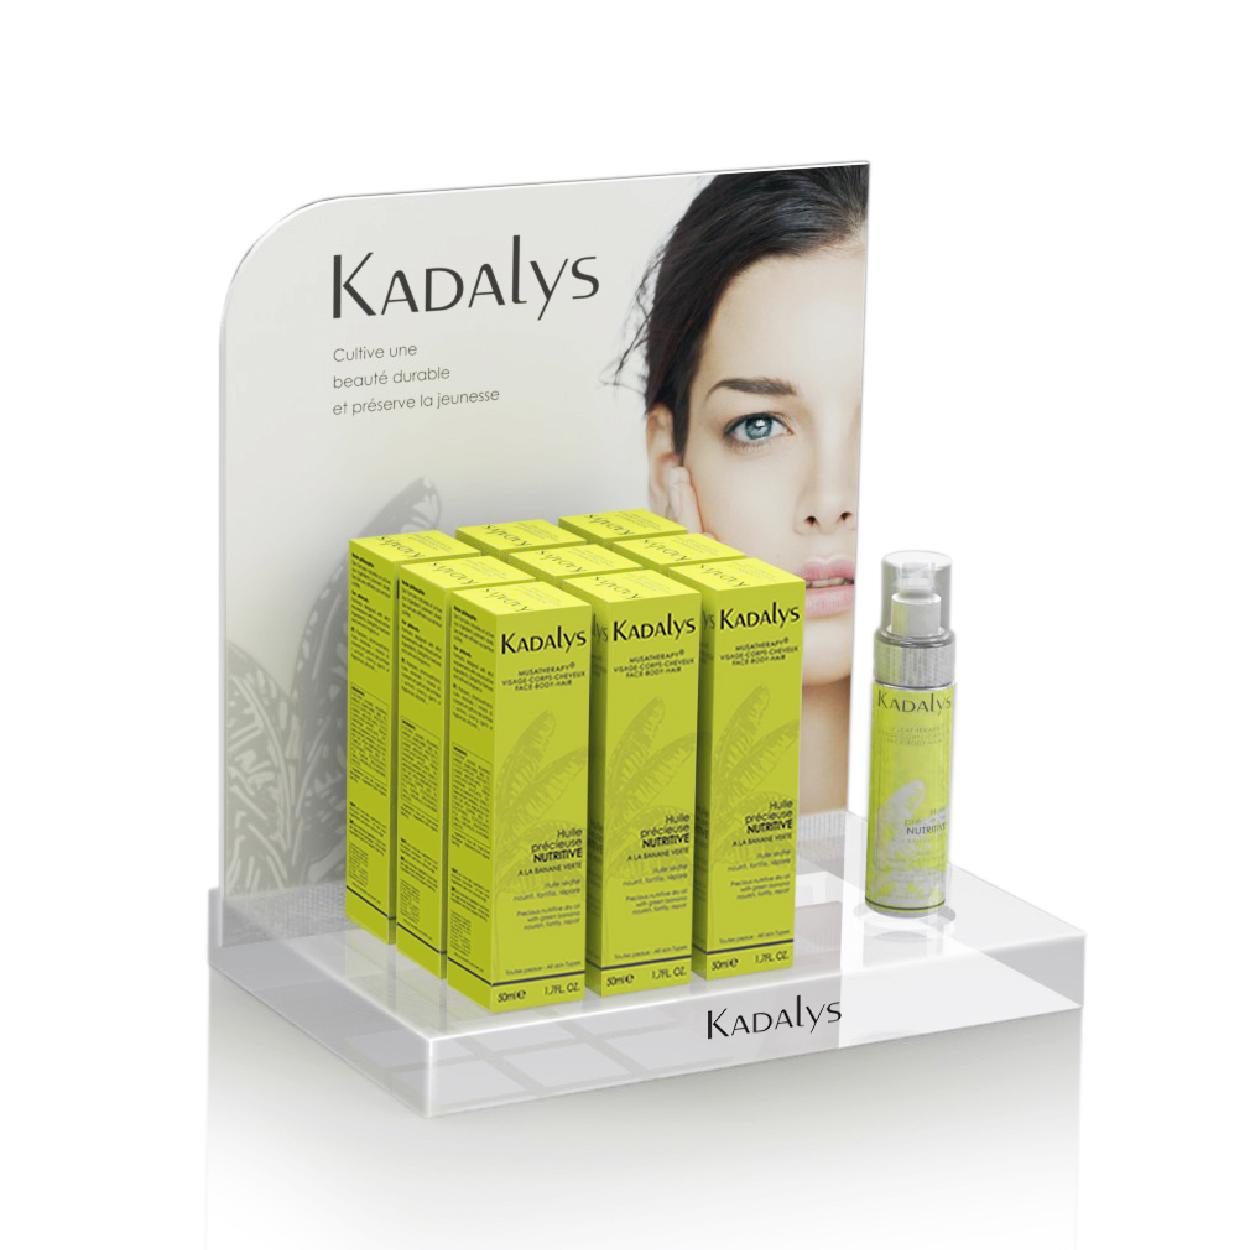 Création Présentoir Kadalys Bio cosmétique Organic Beauty 1703 Factory